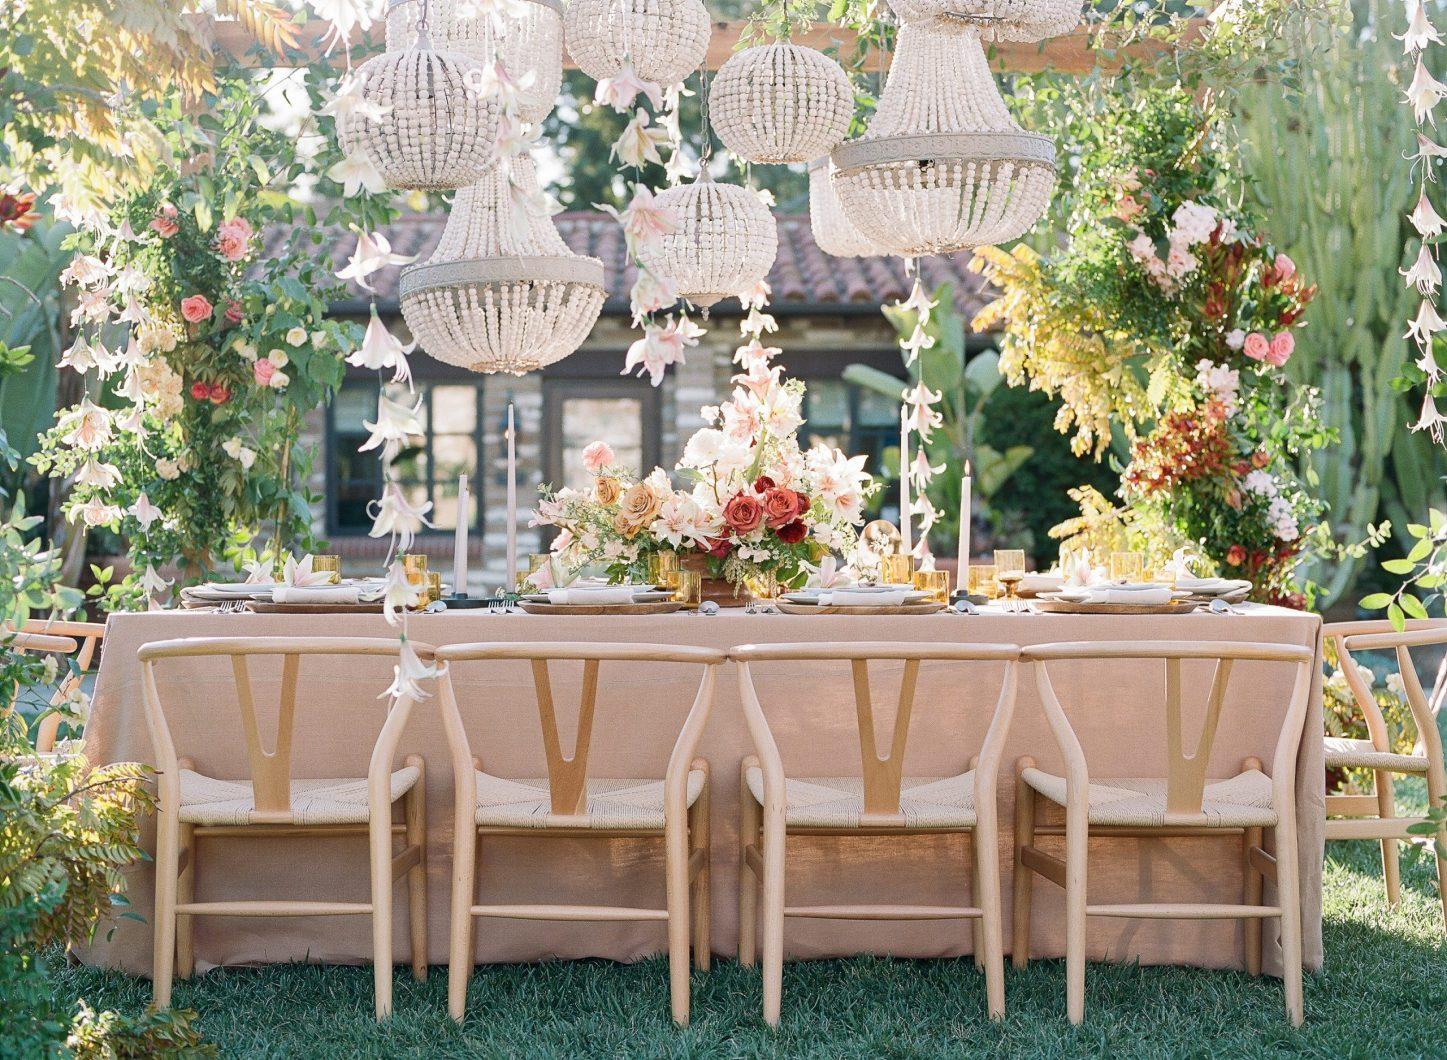 sandiego_estancia_garden_wedding_photos_by_samantha_look